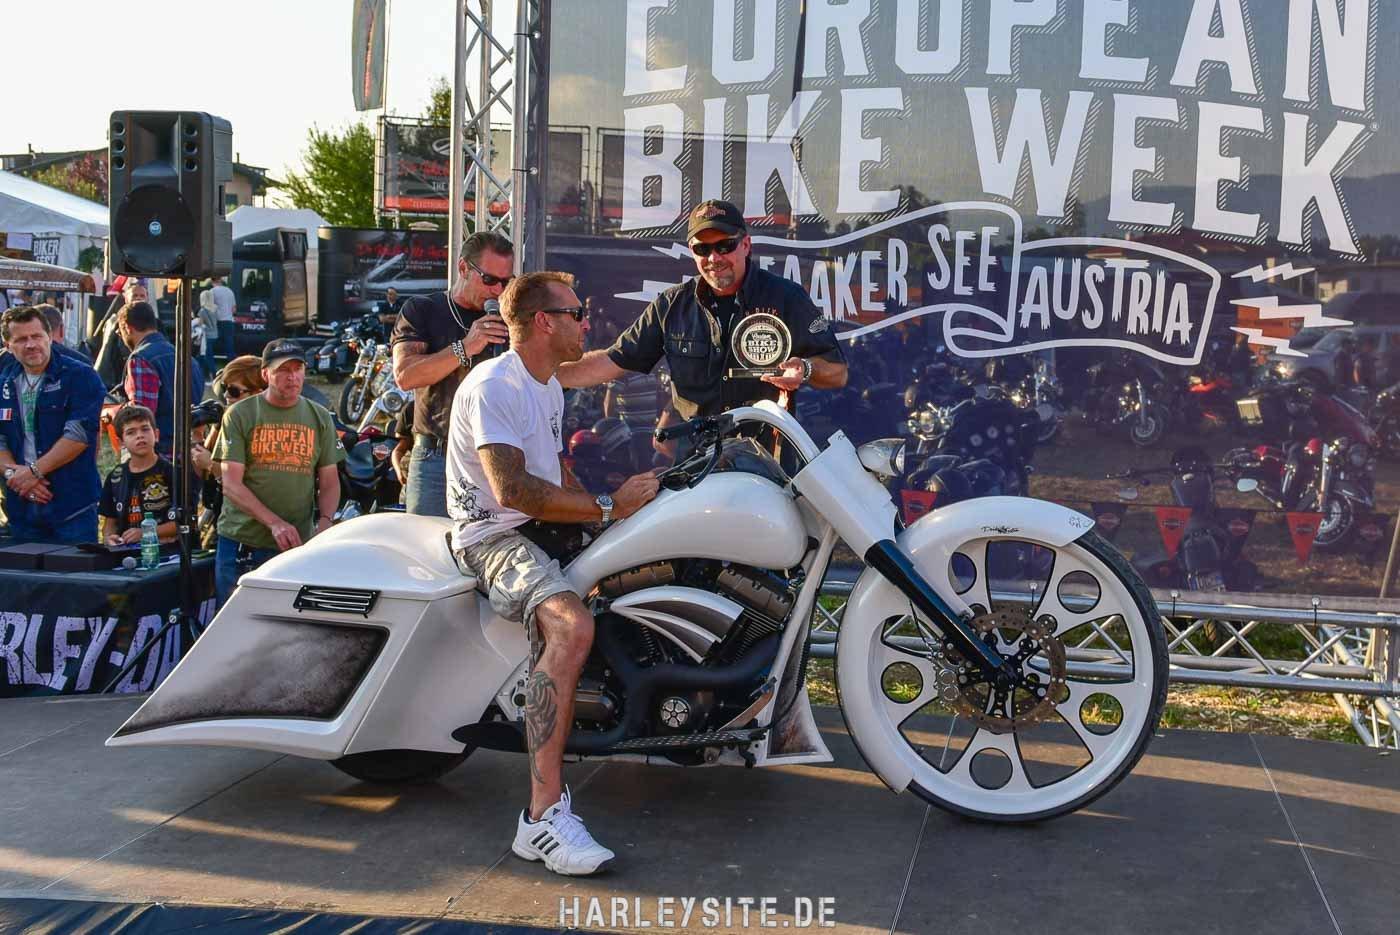 European-Bike-Week-0739